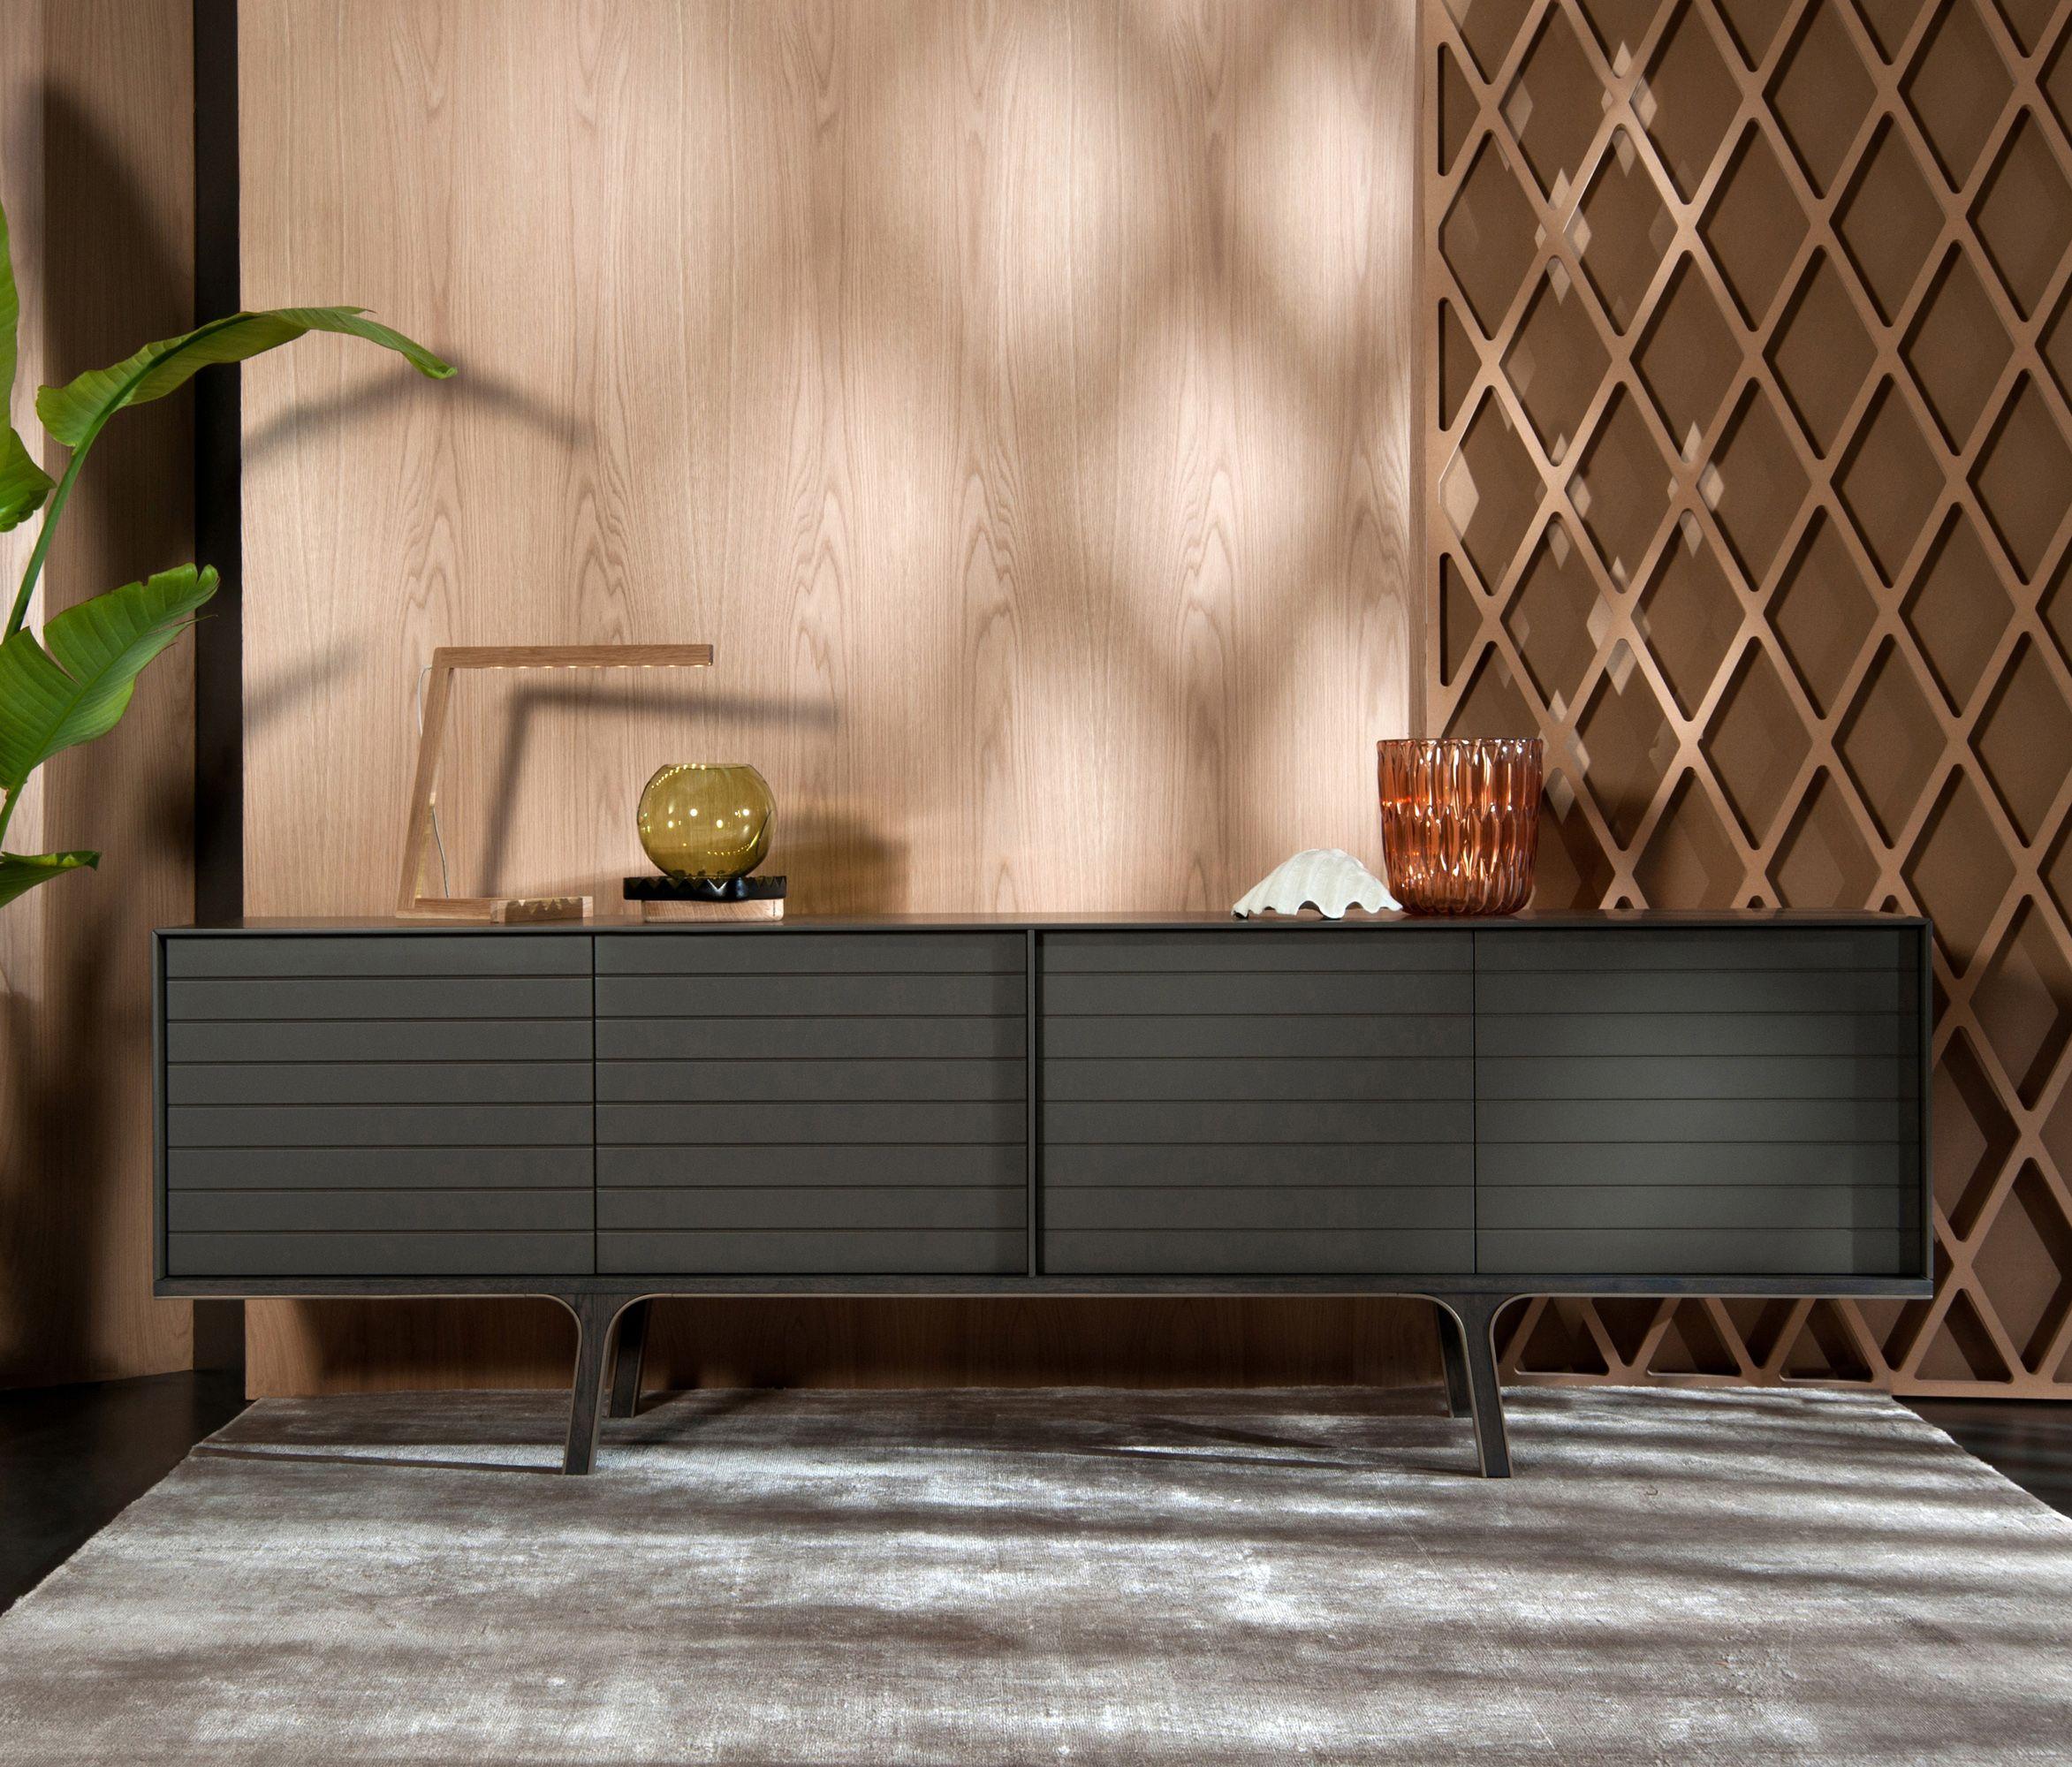 Massivholzmöbel sideboard modern  Minimalistisches, modernes Sideboard von al2. #Sideboard #modern ...